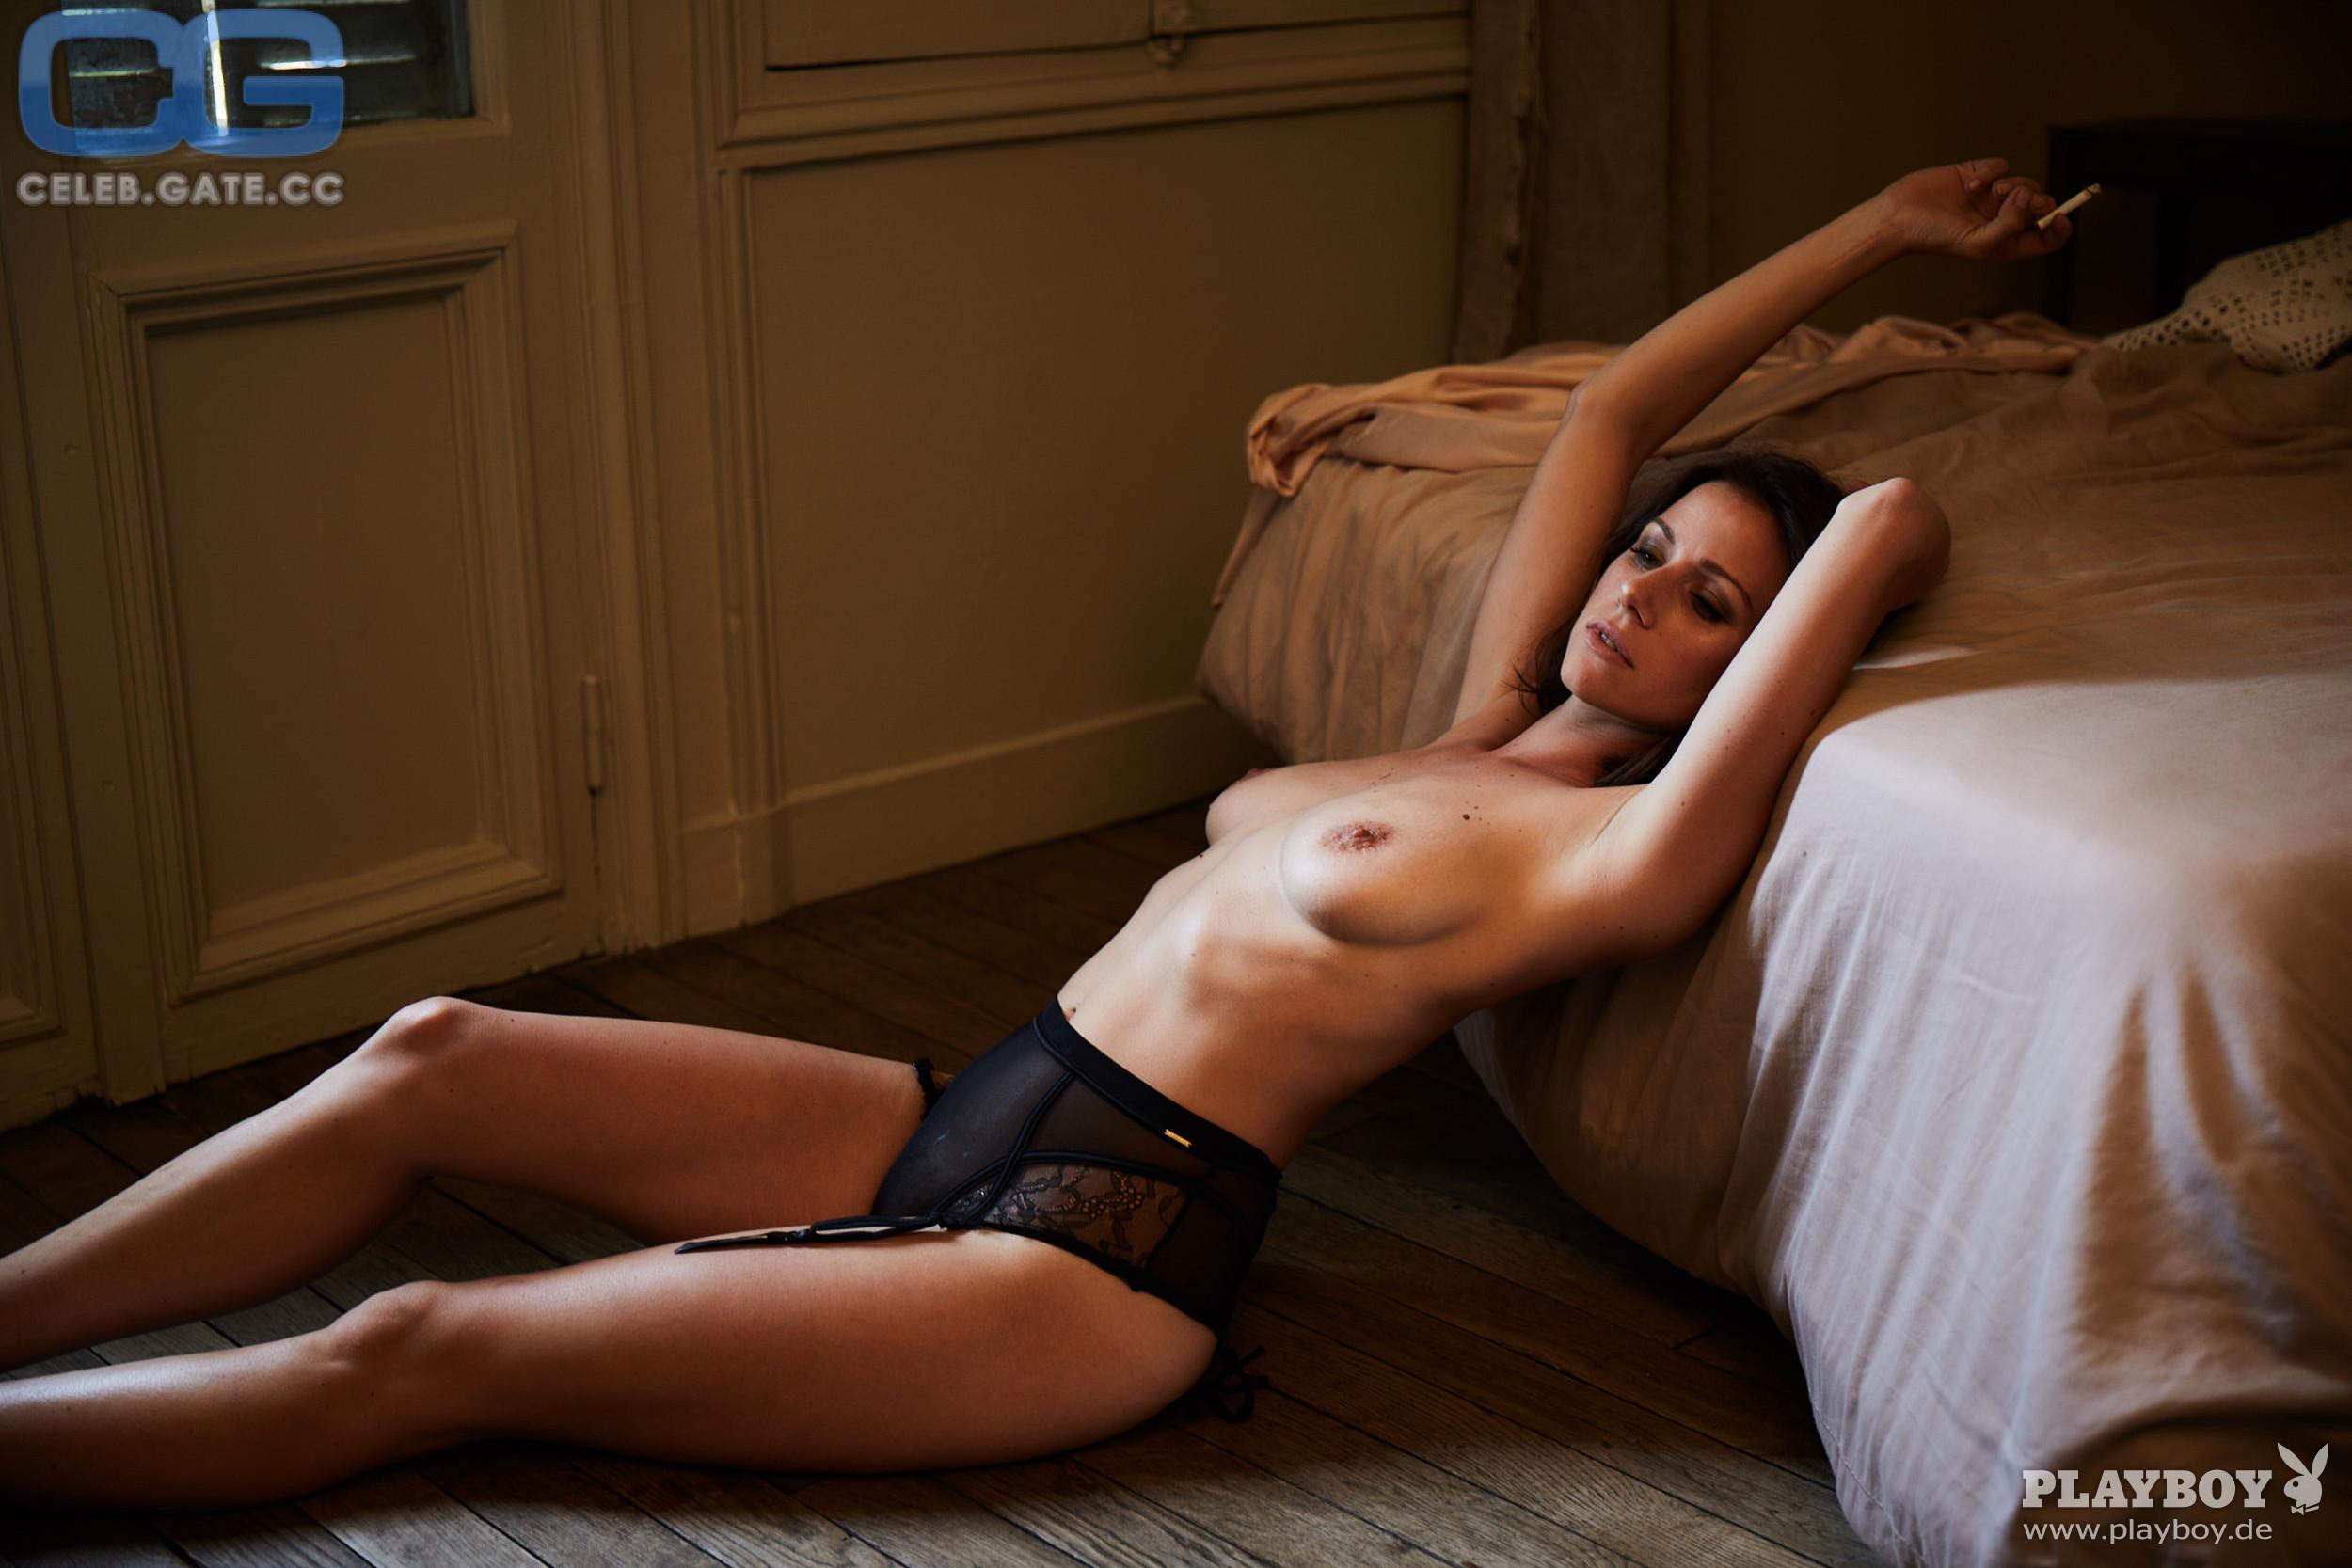 Katrin heß nude playboy